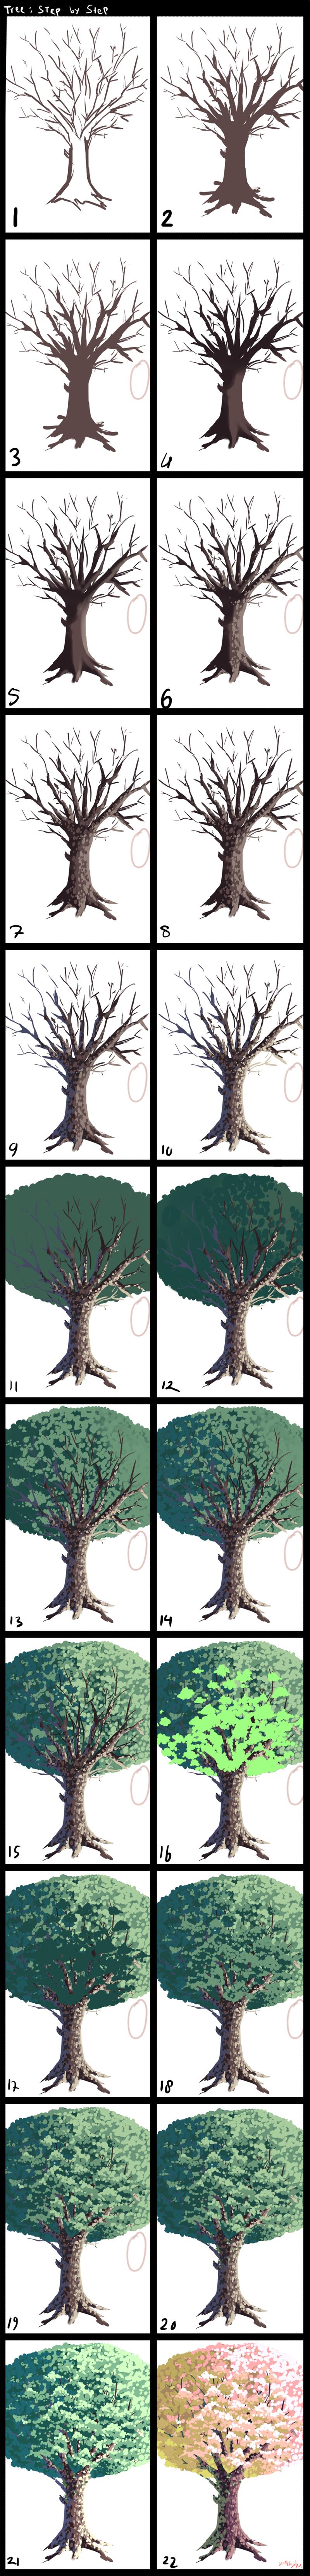 Tree : step by step by craytm